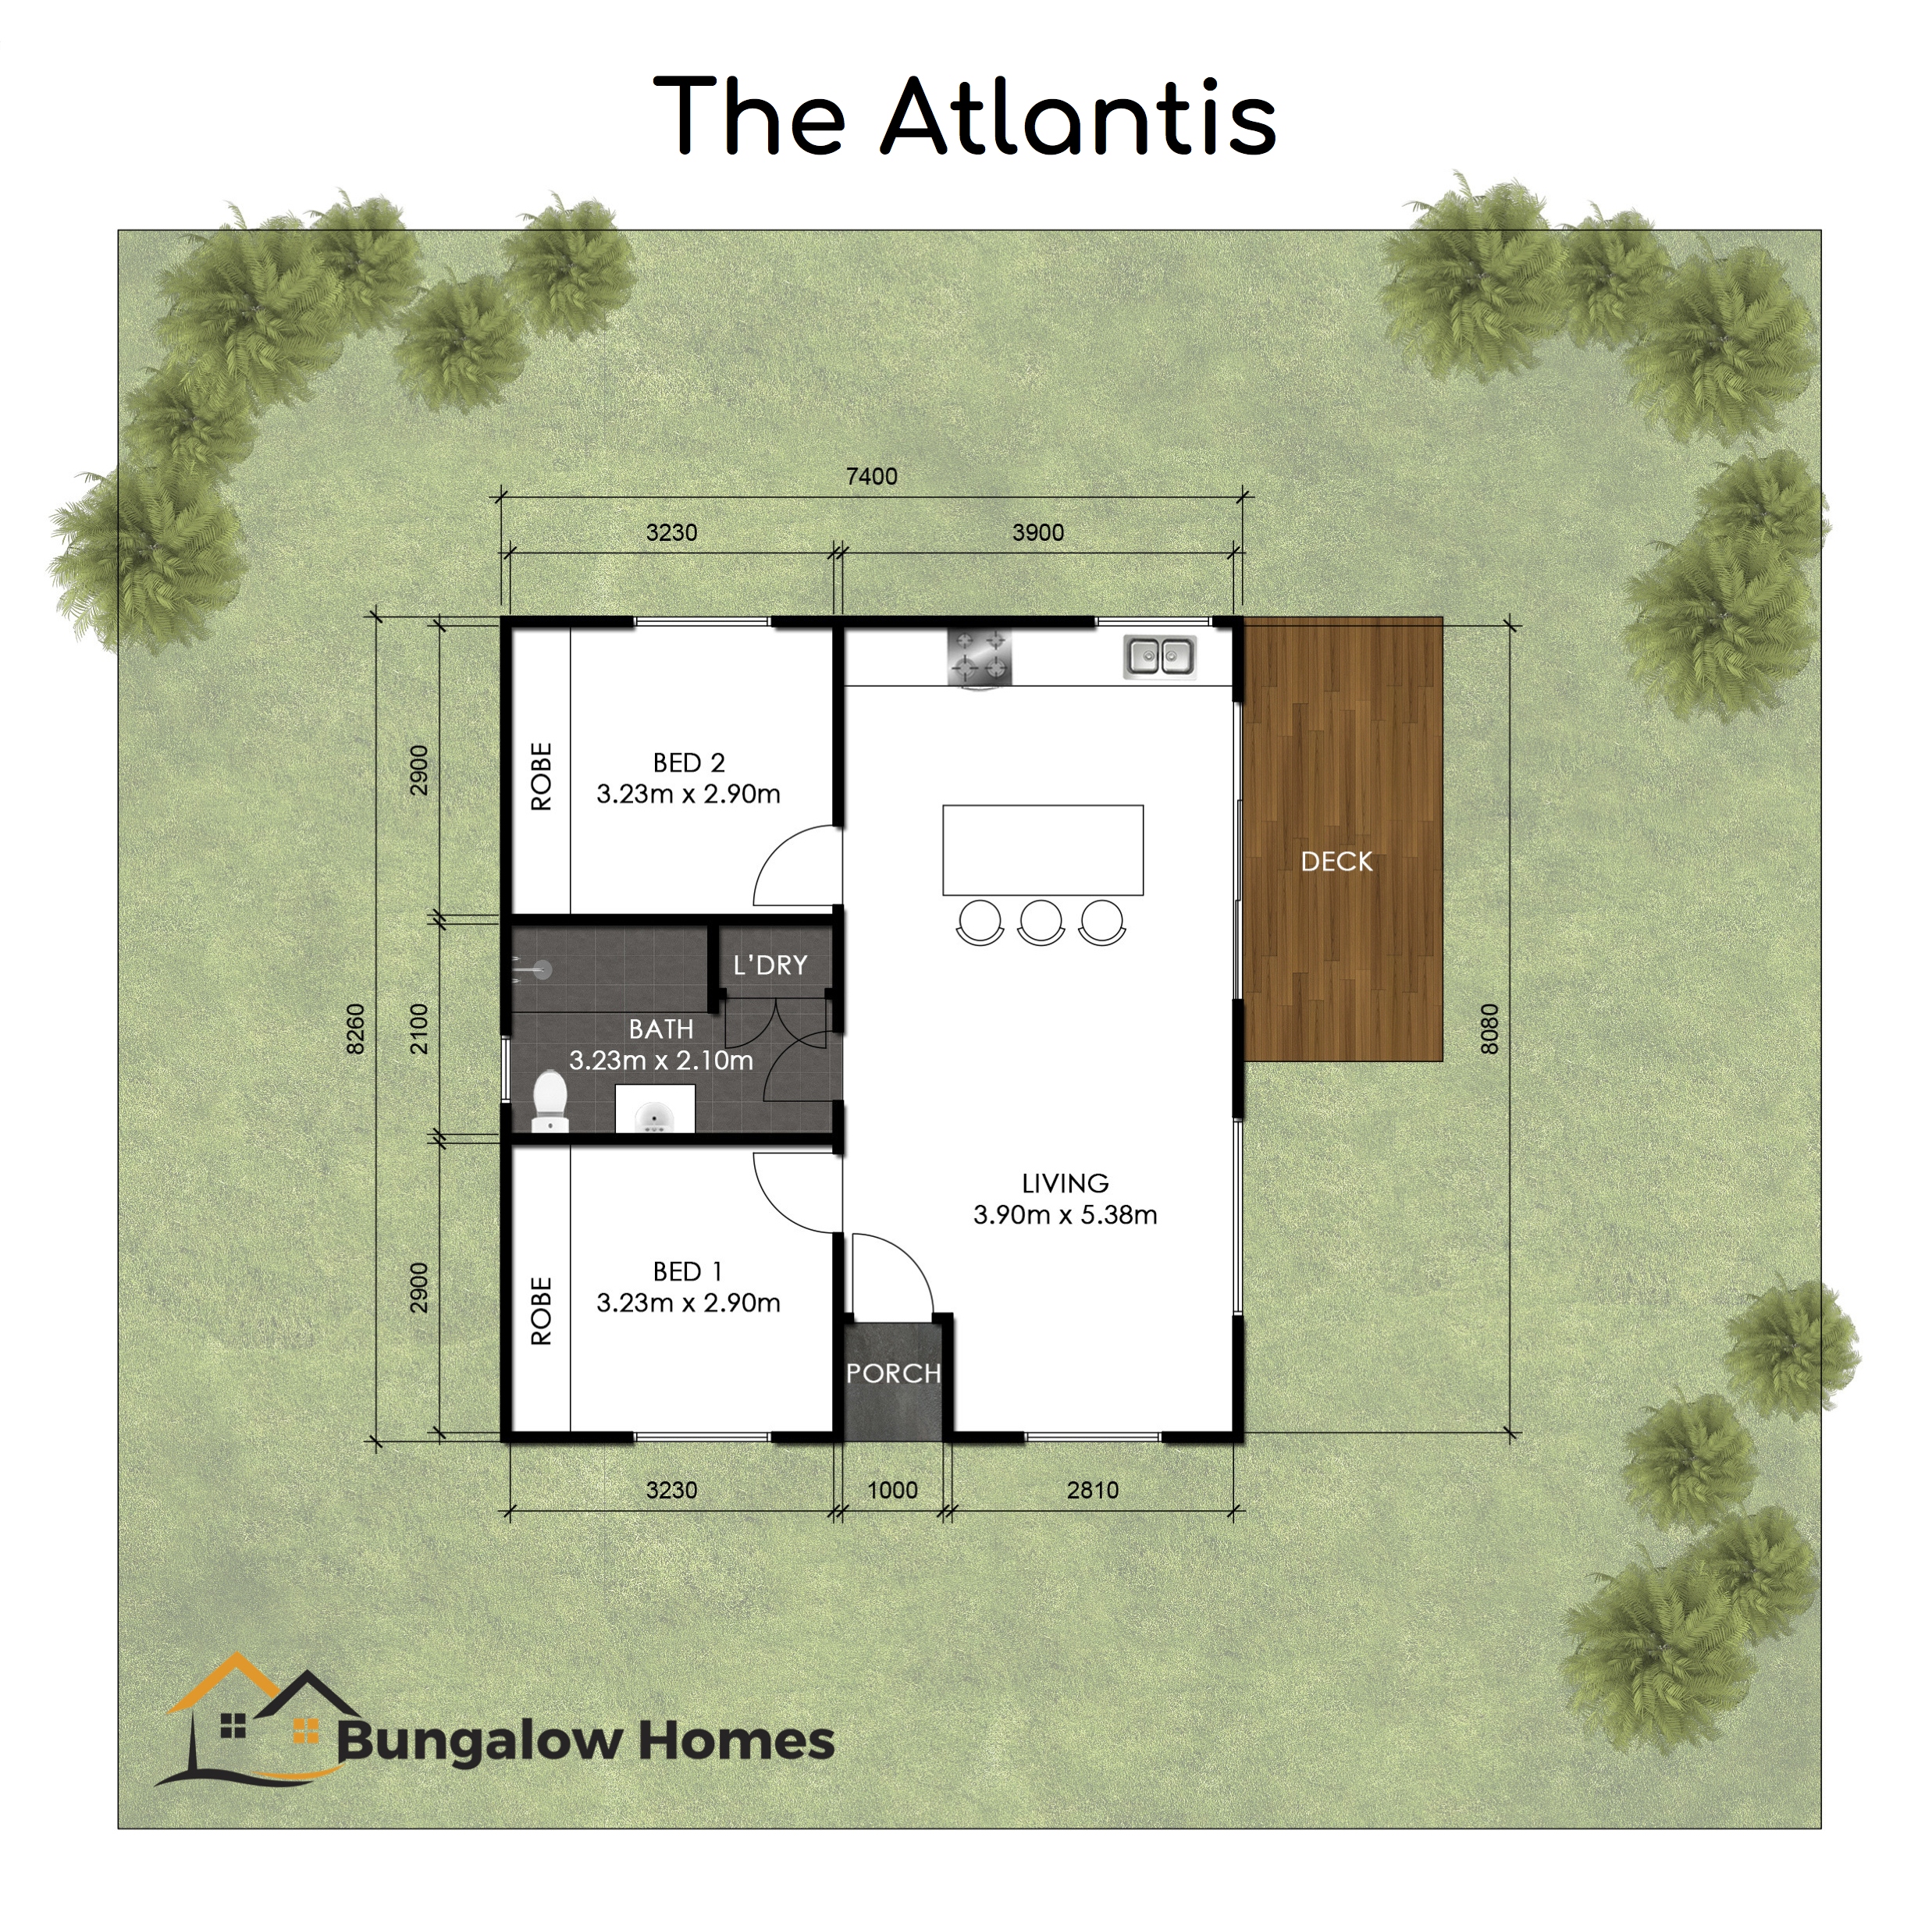 Atlantis Bungalow Homes Granny Flat Design Floor Plan.png